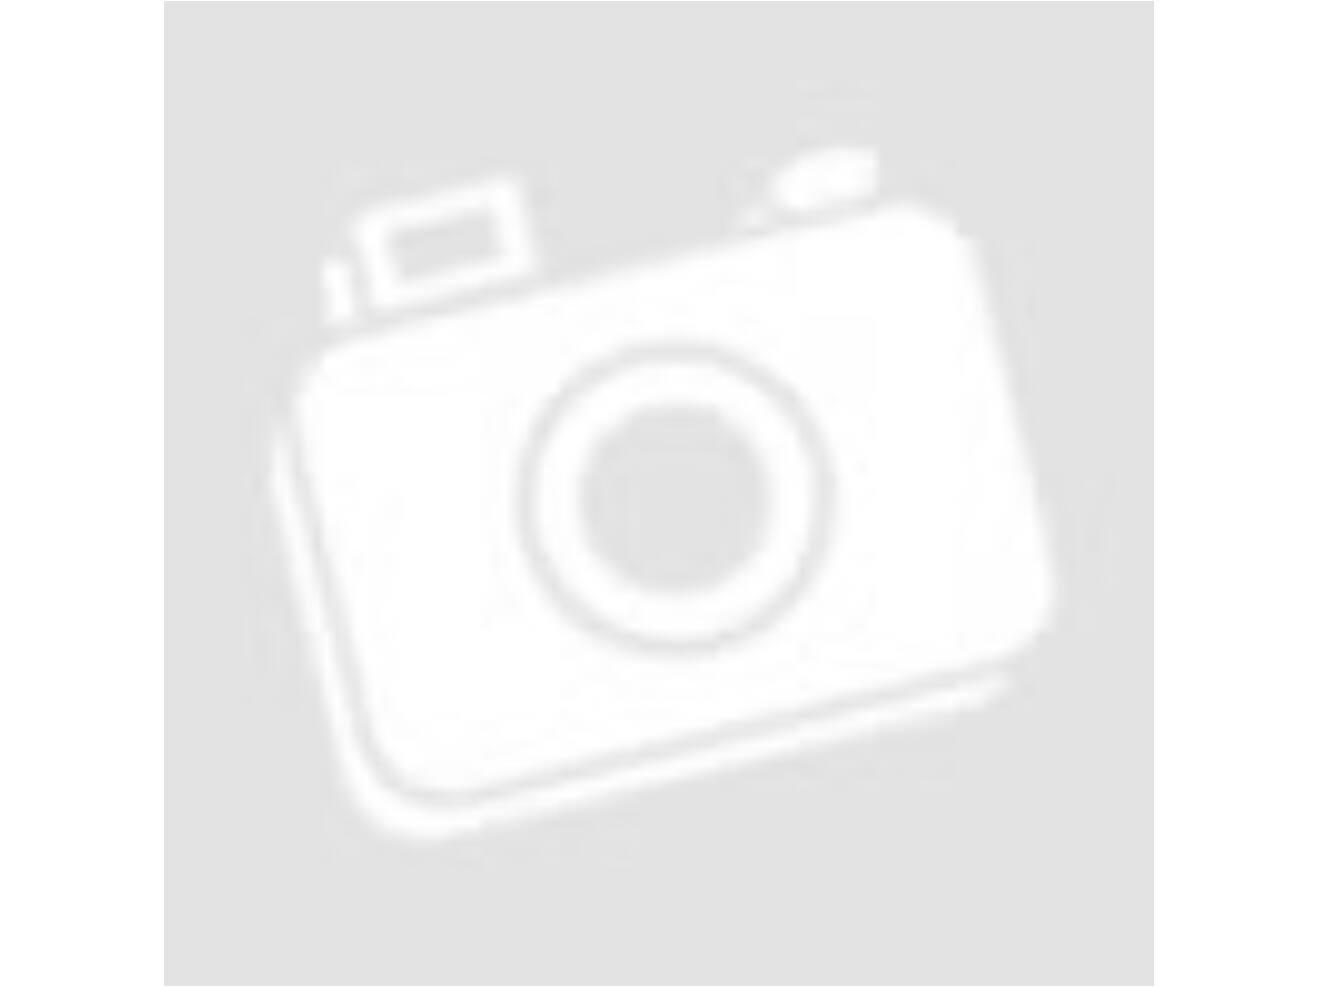 NIKE MAGISTA OBRA II FG - FG AG (Műanyag stoplis) - Alexandersoccershoes cb4d8f7b4c